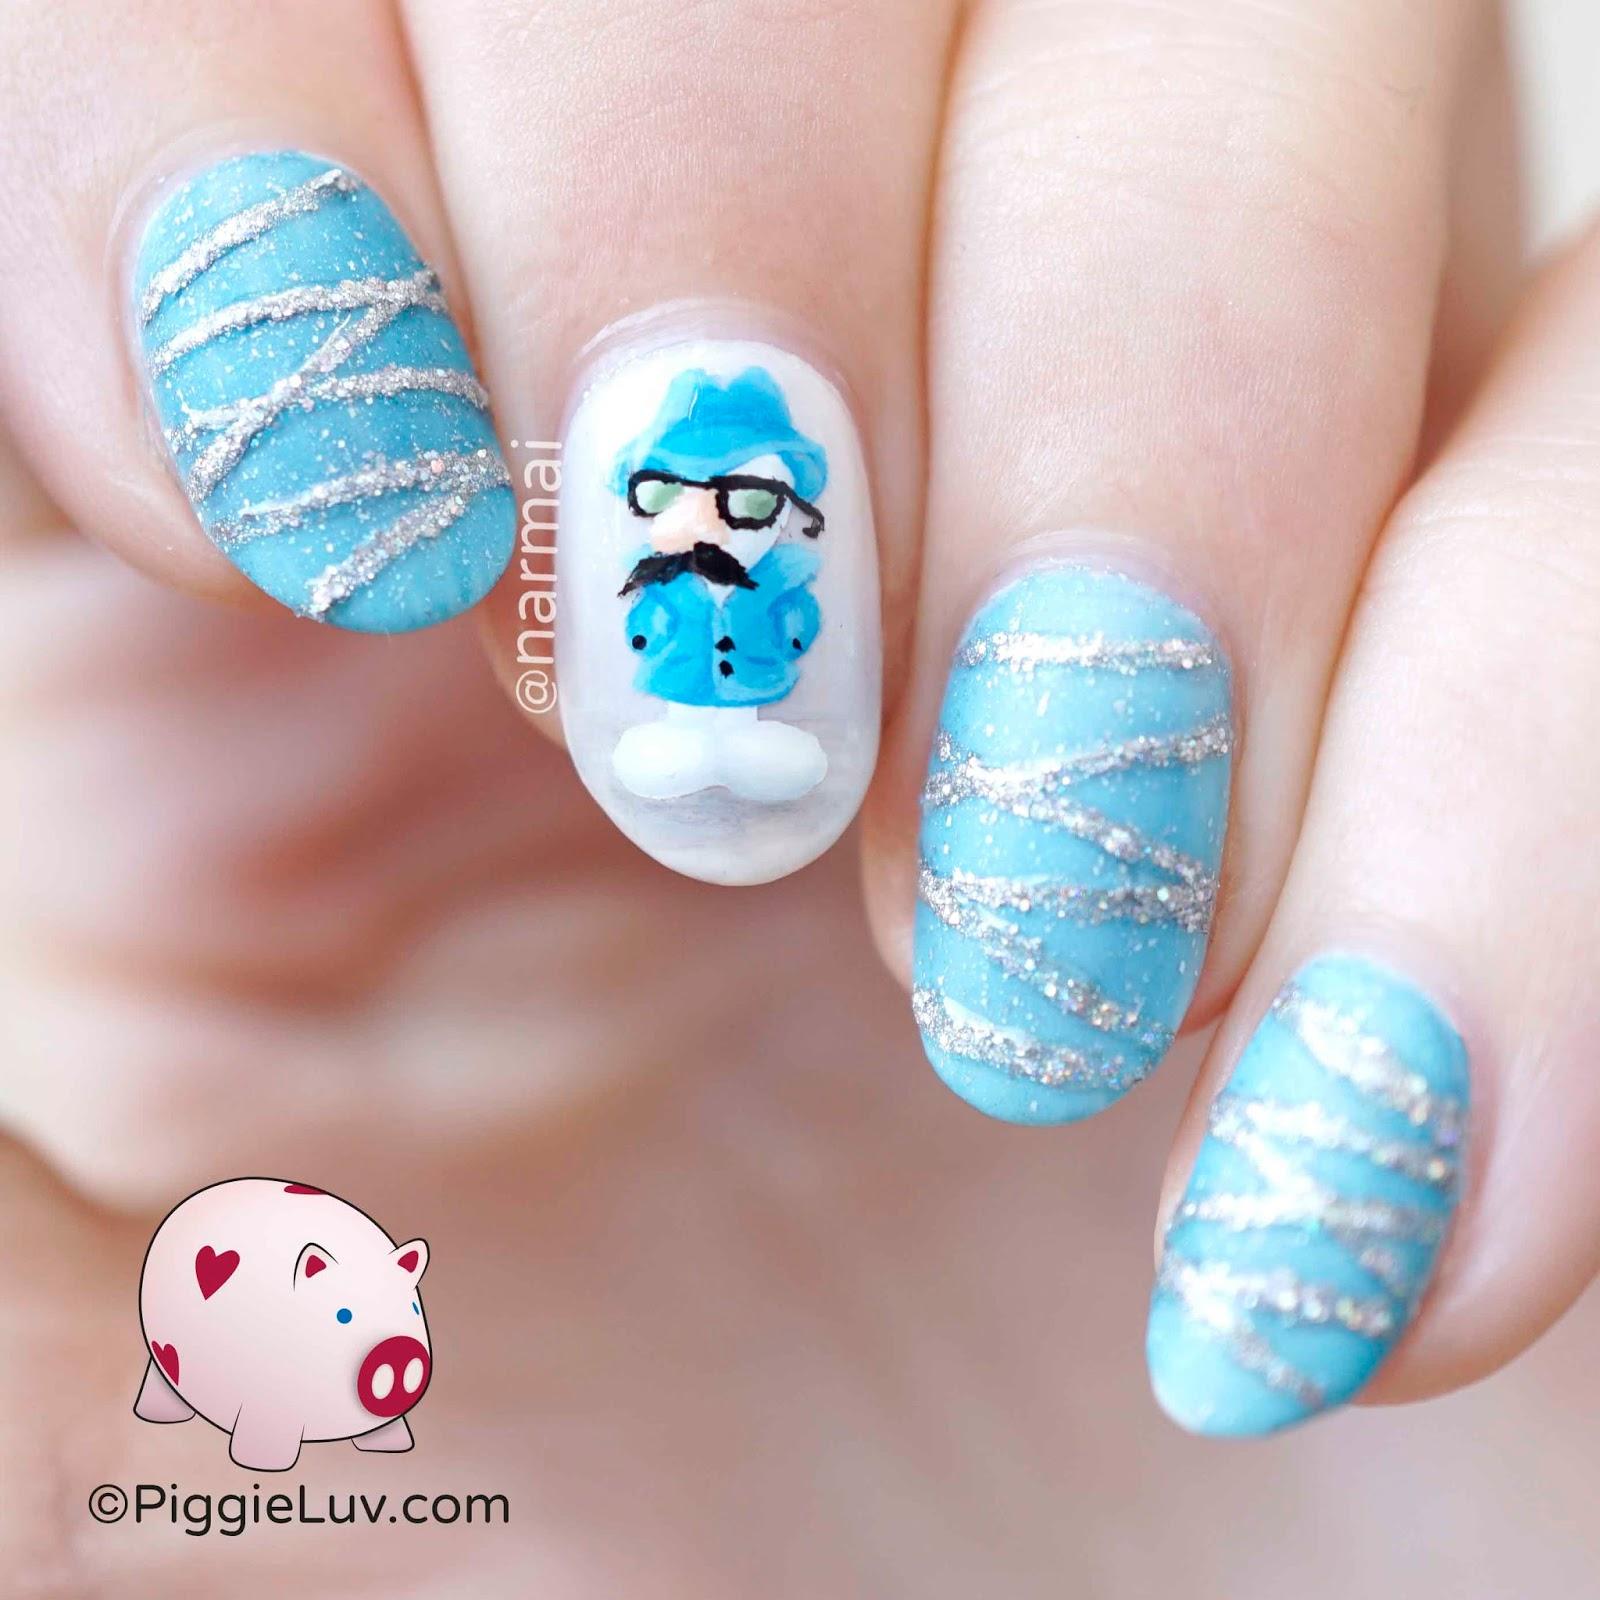 PiggieLuv: Undercover snowman nail art